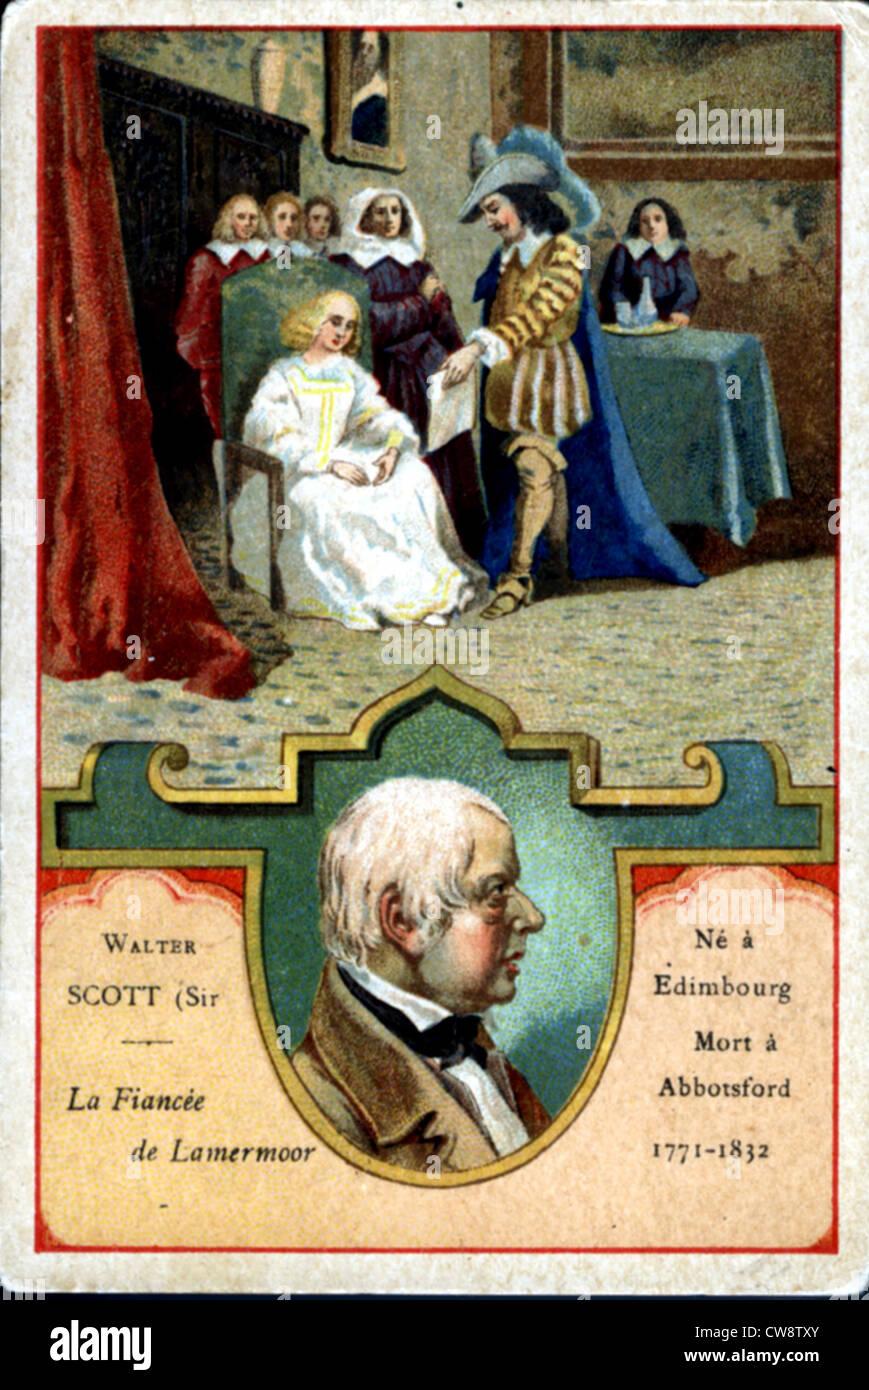 Colored lithograph : Walter Scott : Bride Lammermoor - Stock Image